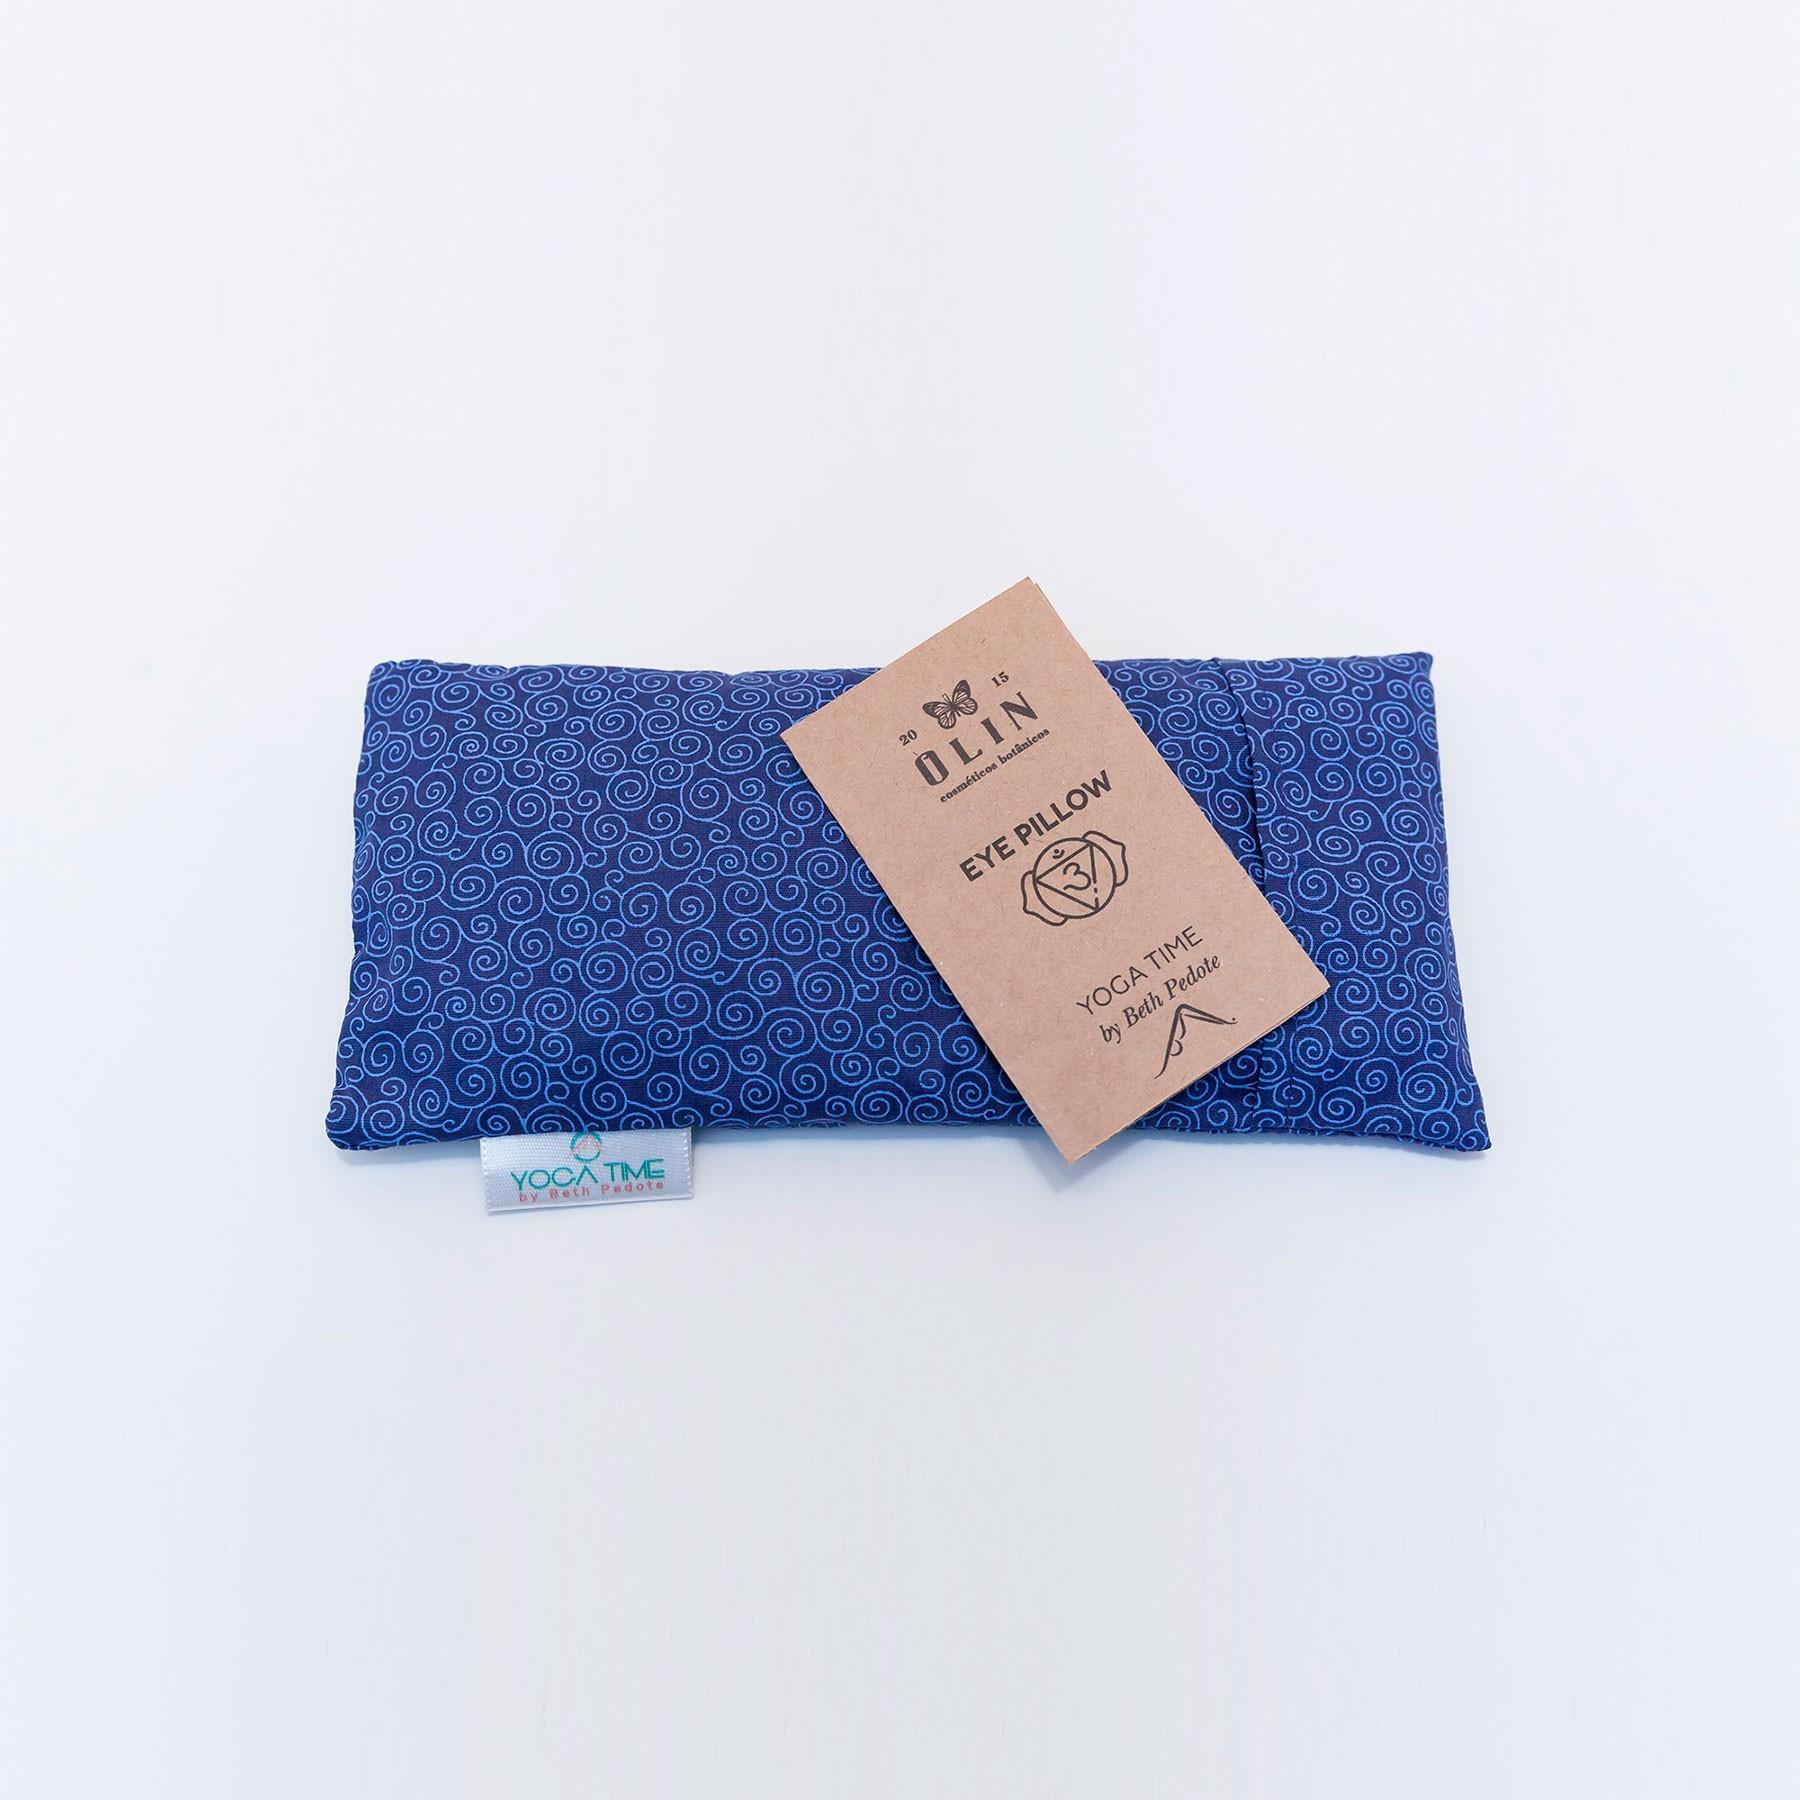 Natal Relax corpo & Face. Sabonete Líquido Facial + Emulsão Corporal Hidratante + Almofada Térmica Eye Pillow.